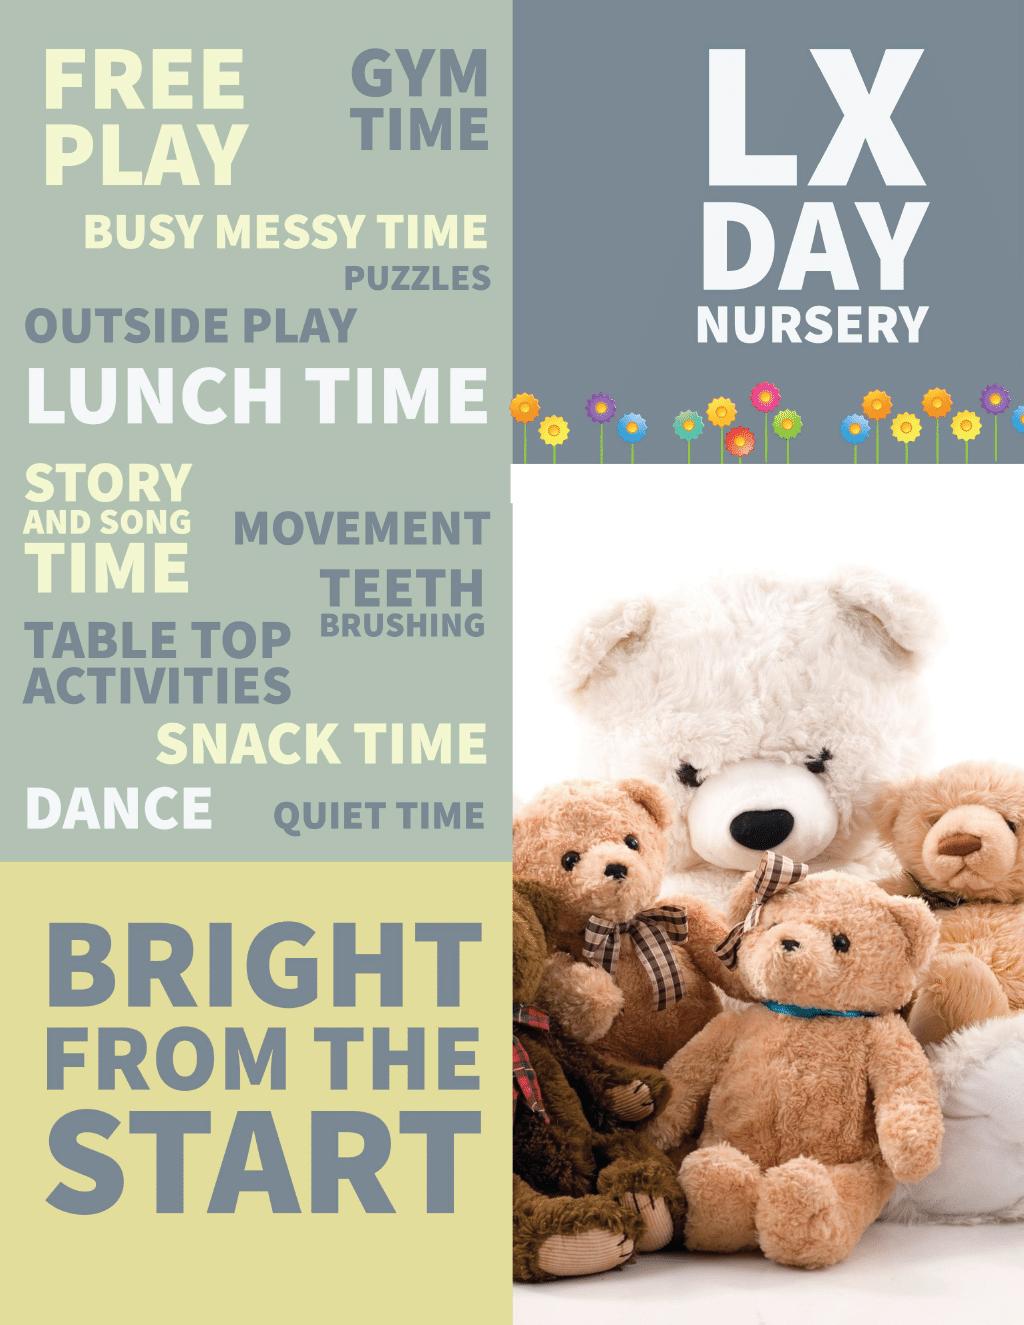 LX Day Nursery poster